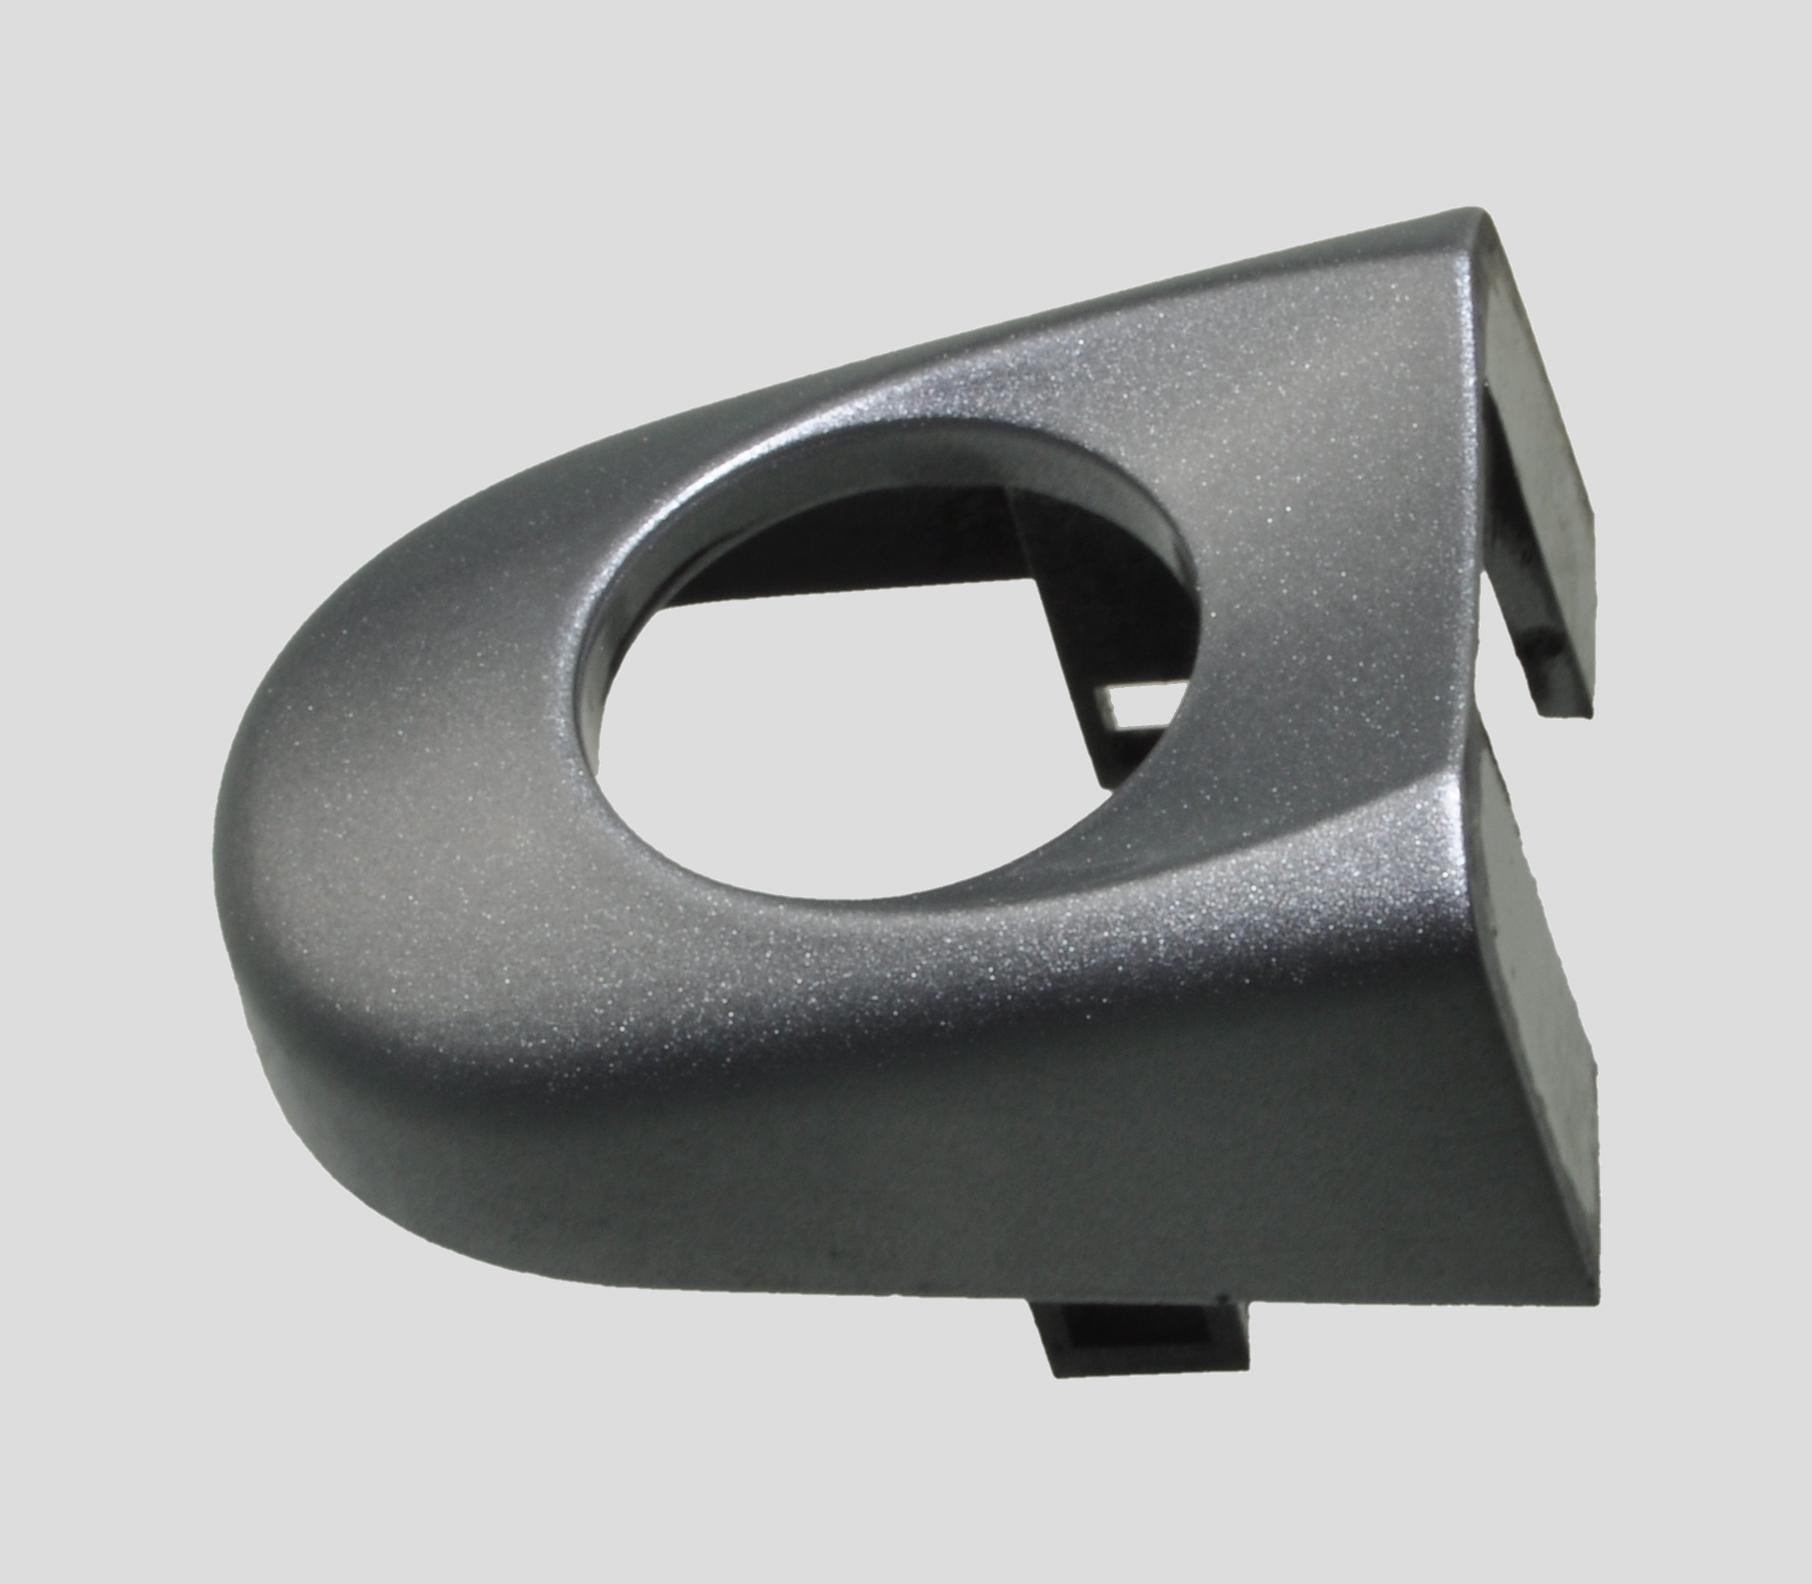 VW Touran 1T Original Kappe Türgriff reflexsilber LA7W vorne links 1C0837879